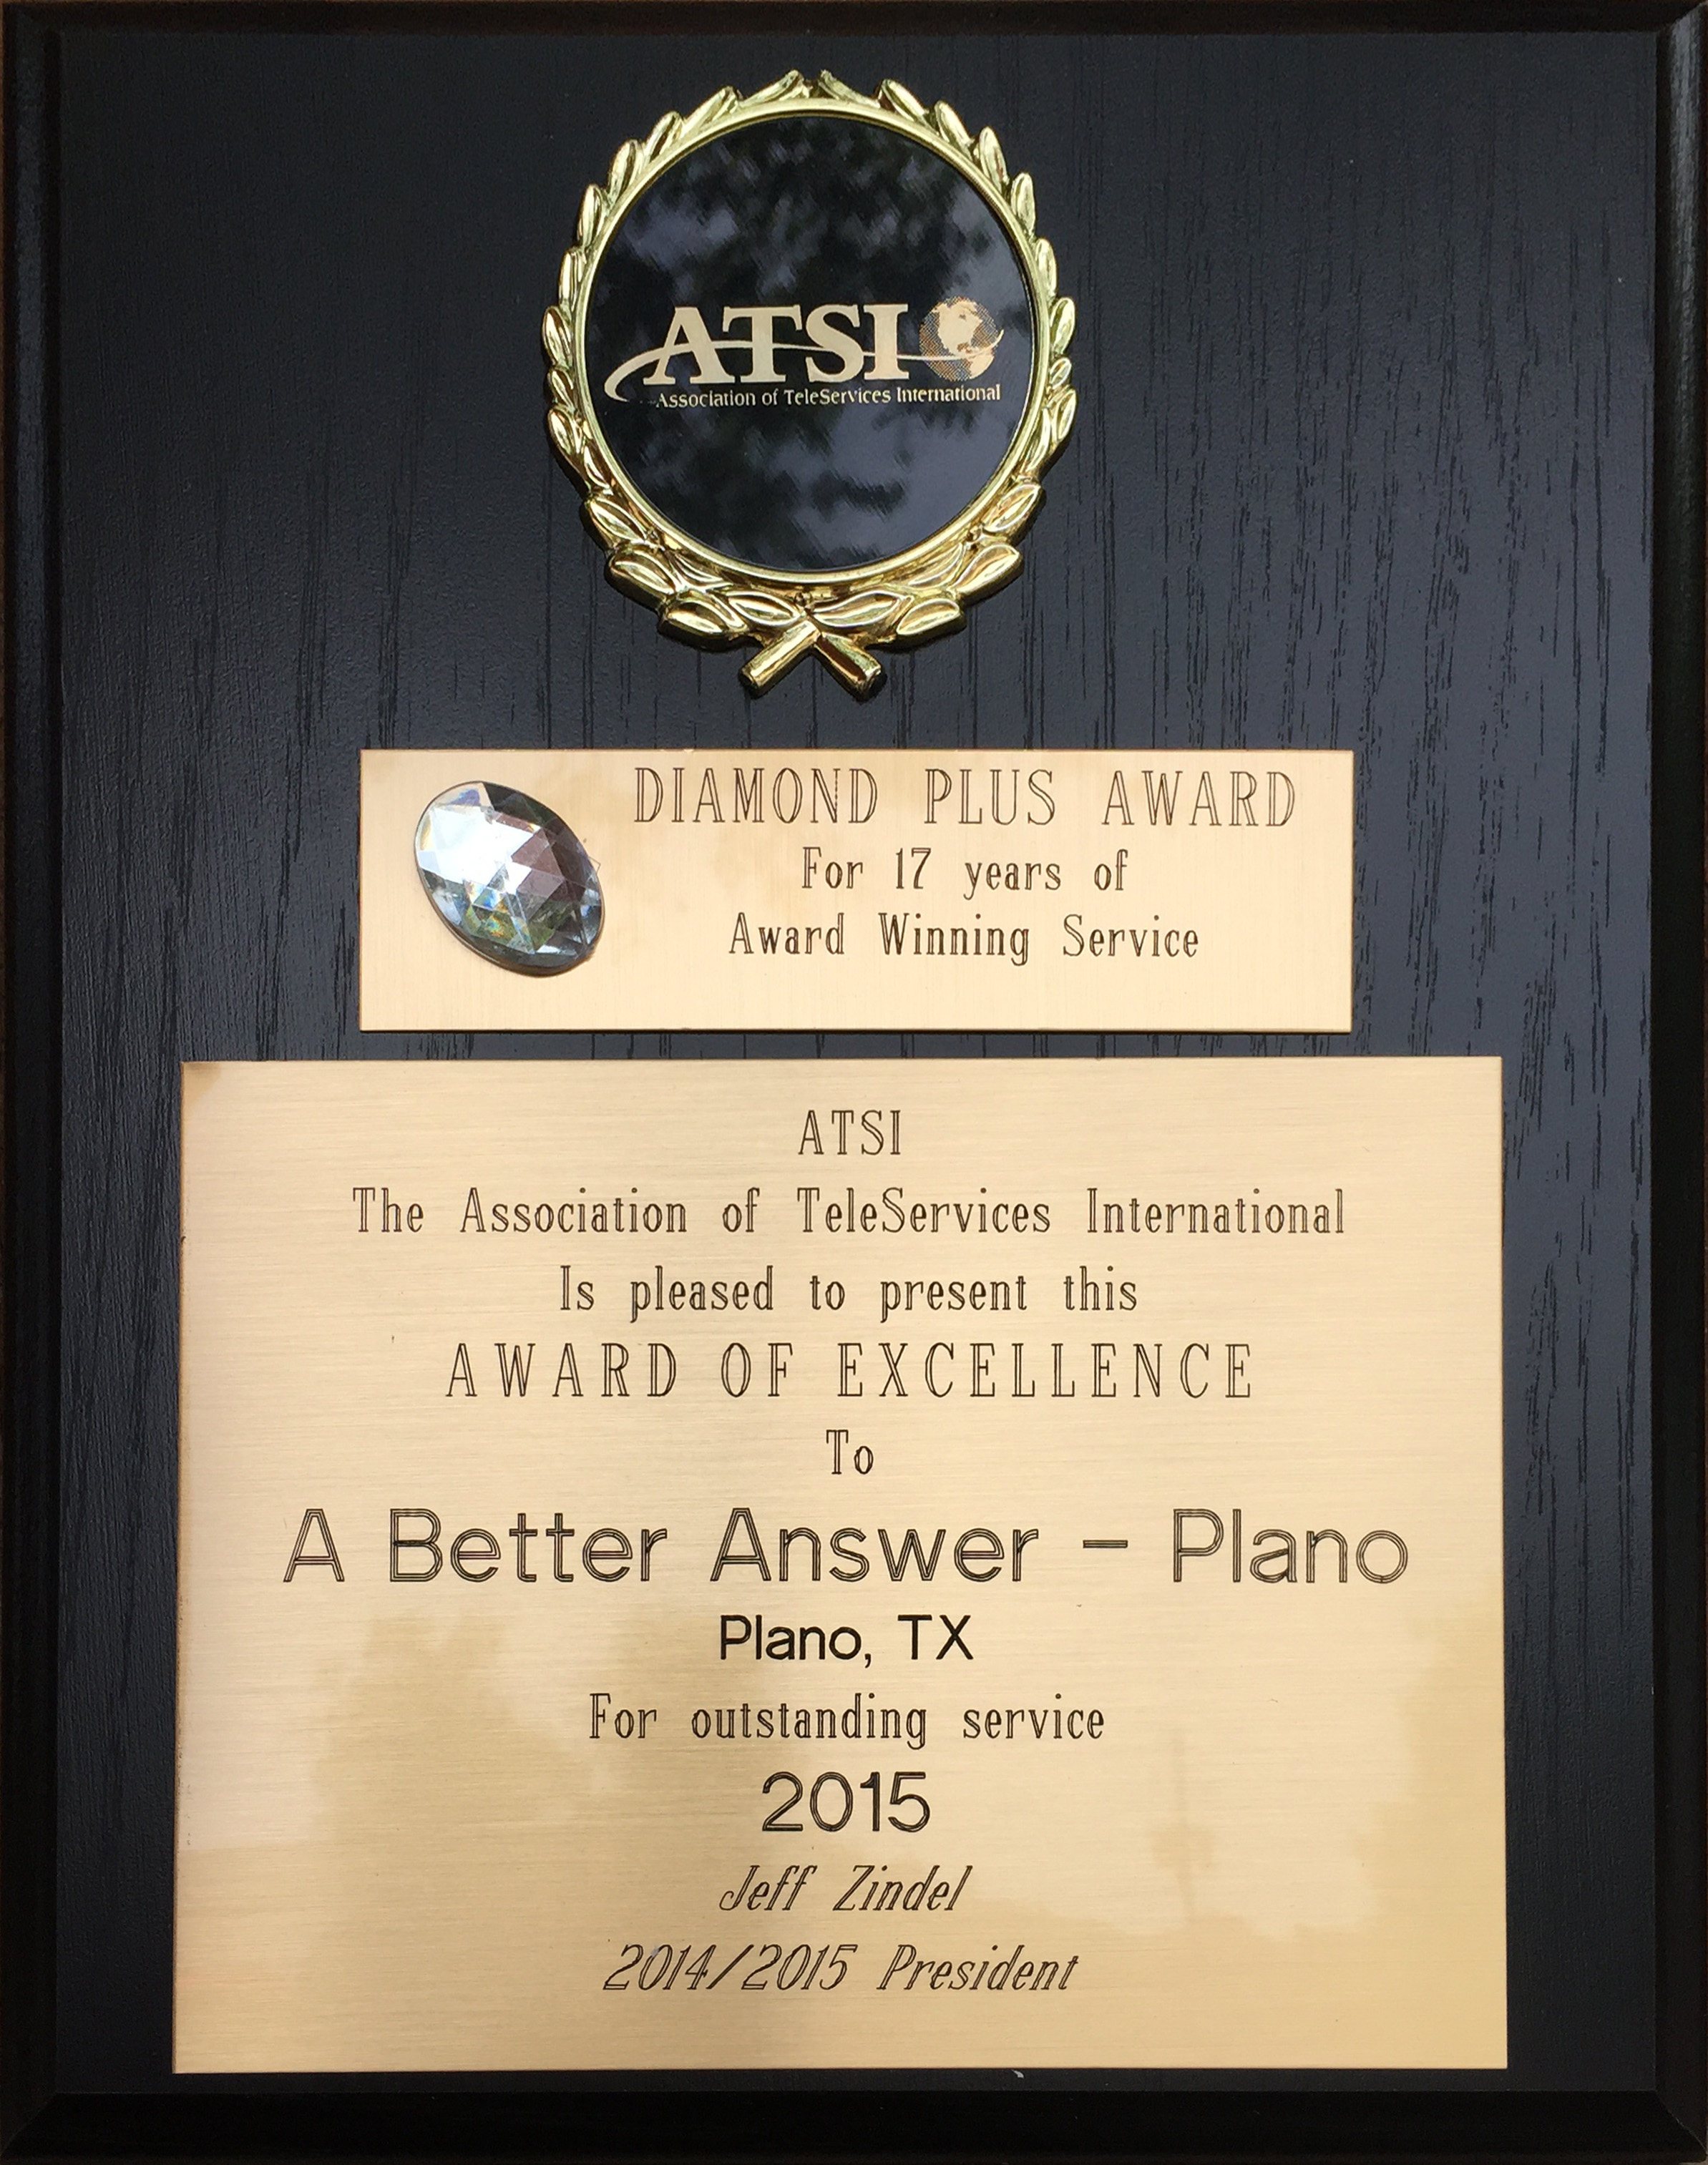 ATSI_Award_2015_-_Plano.jpg